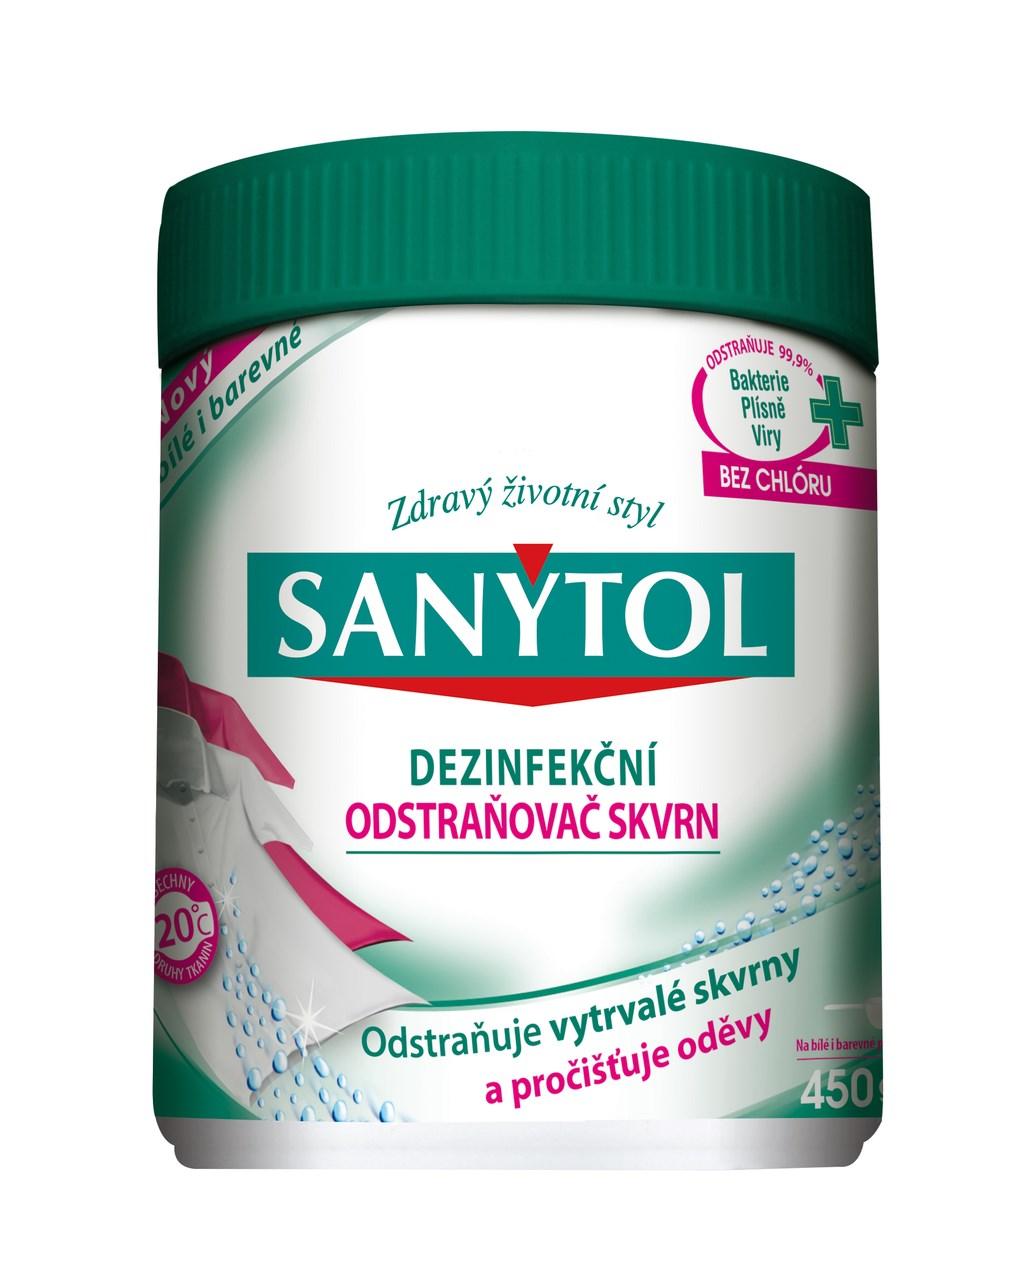 Sanytol dezinfekčný odstraňovač škvŕn 1x450 g